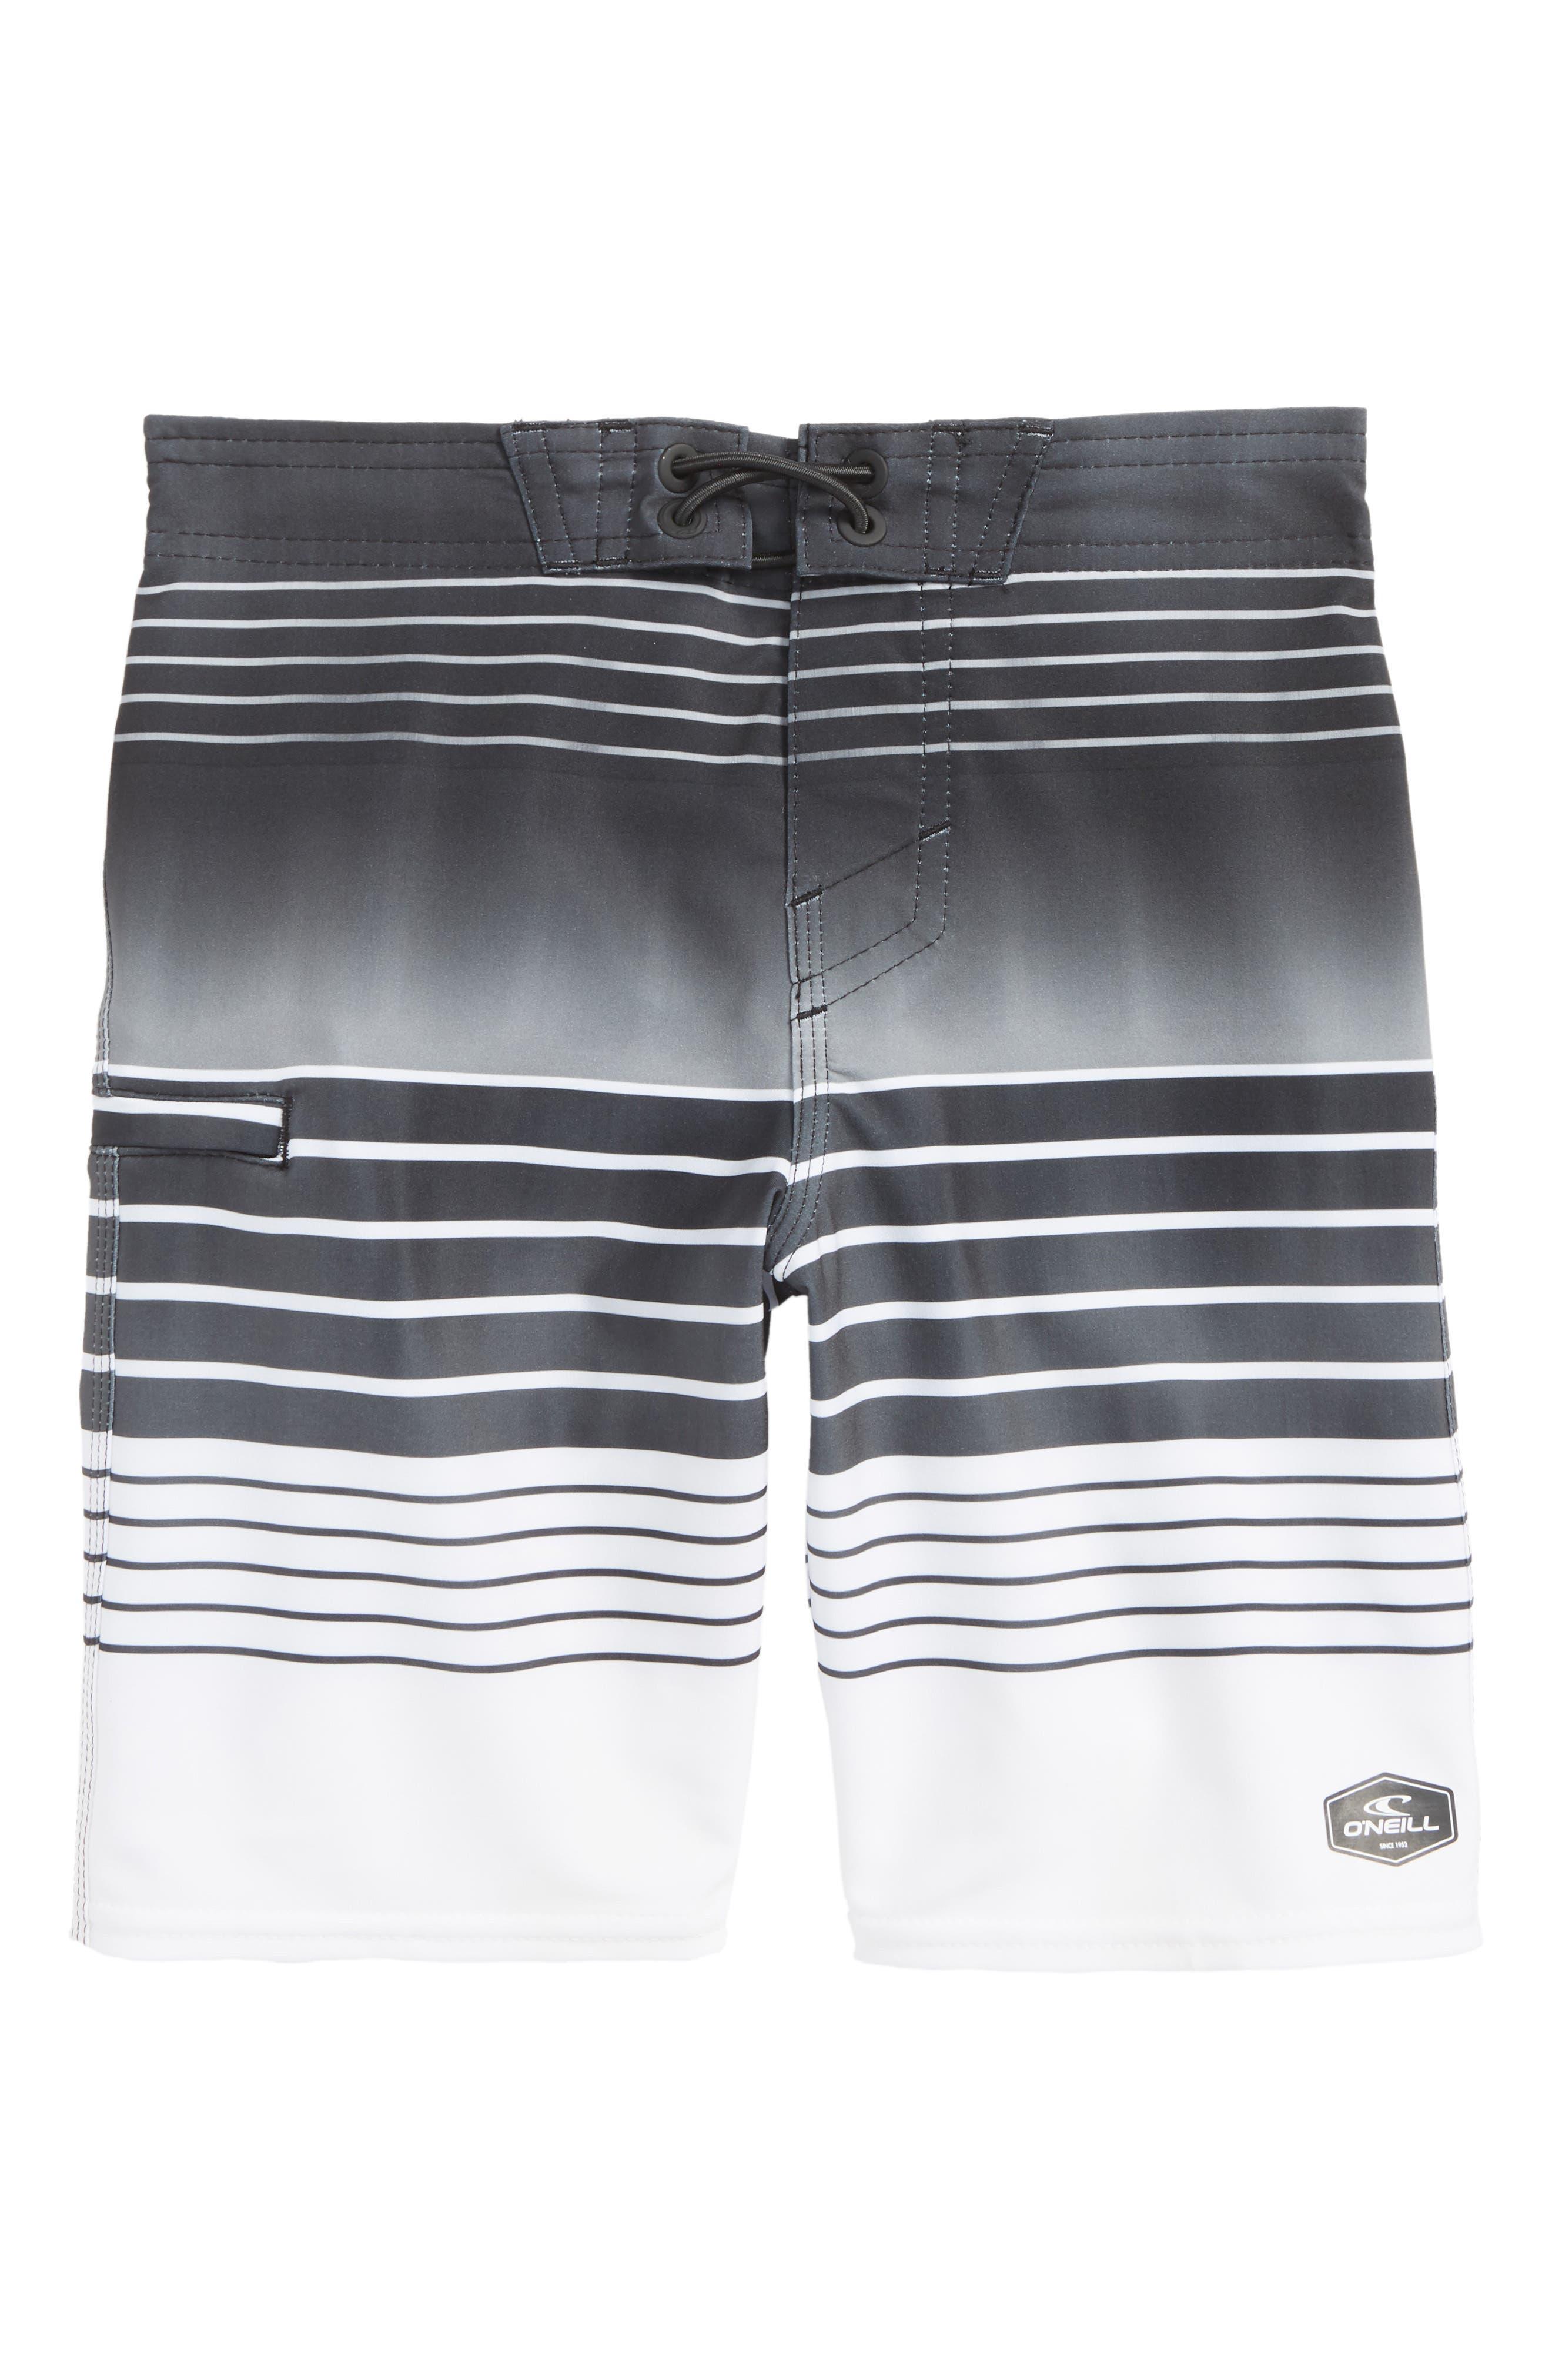 Hyperfreak Heist Board Shorts,                         Main,                         color, Black